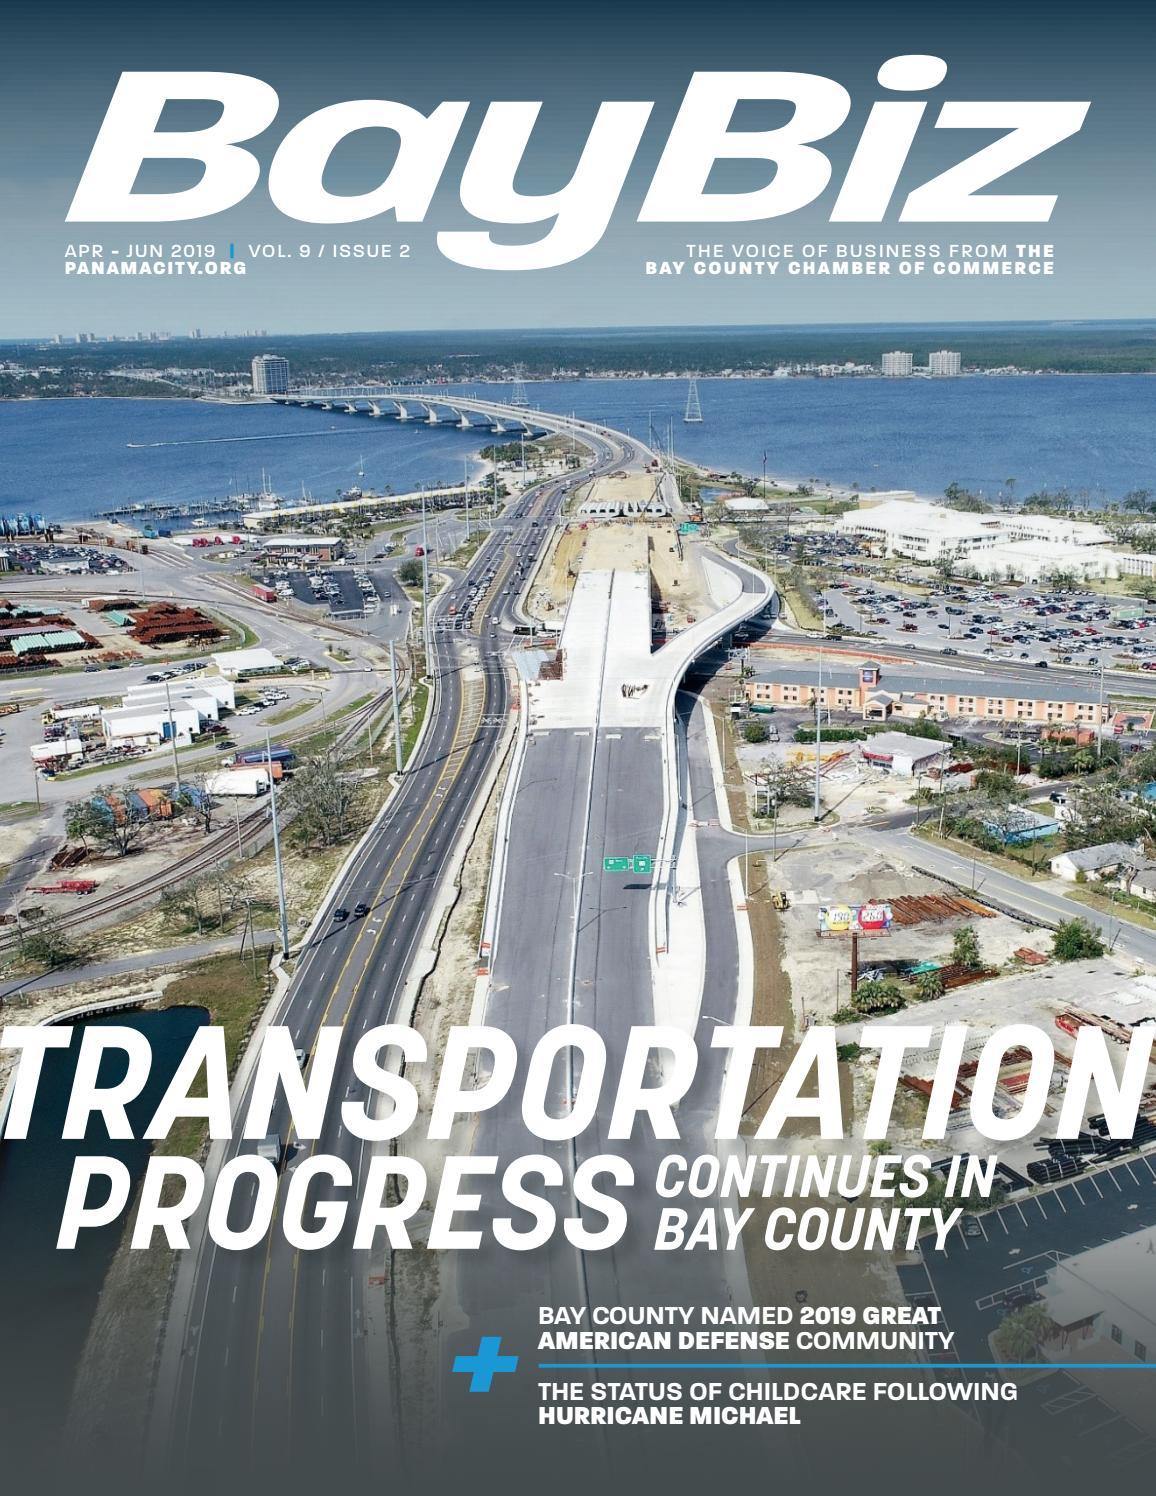 Bay Biz Vol 9/Issue 2 (Apr-Jun) by Bay County Chamber of